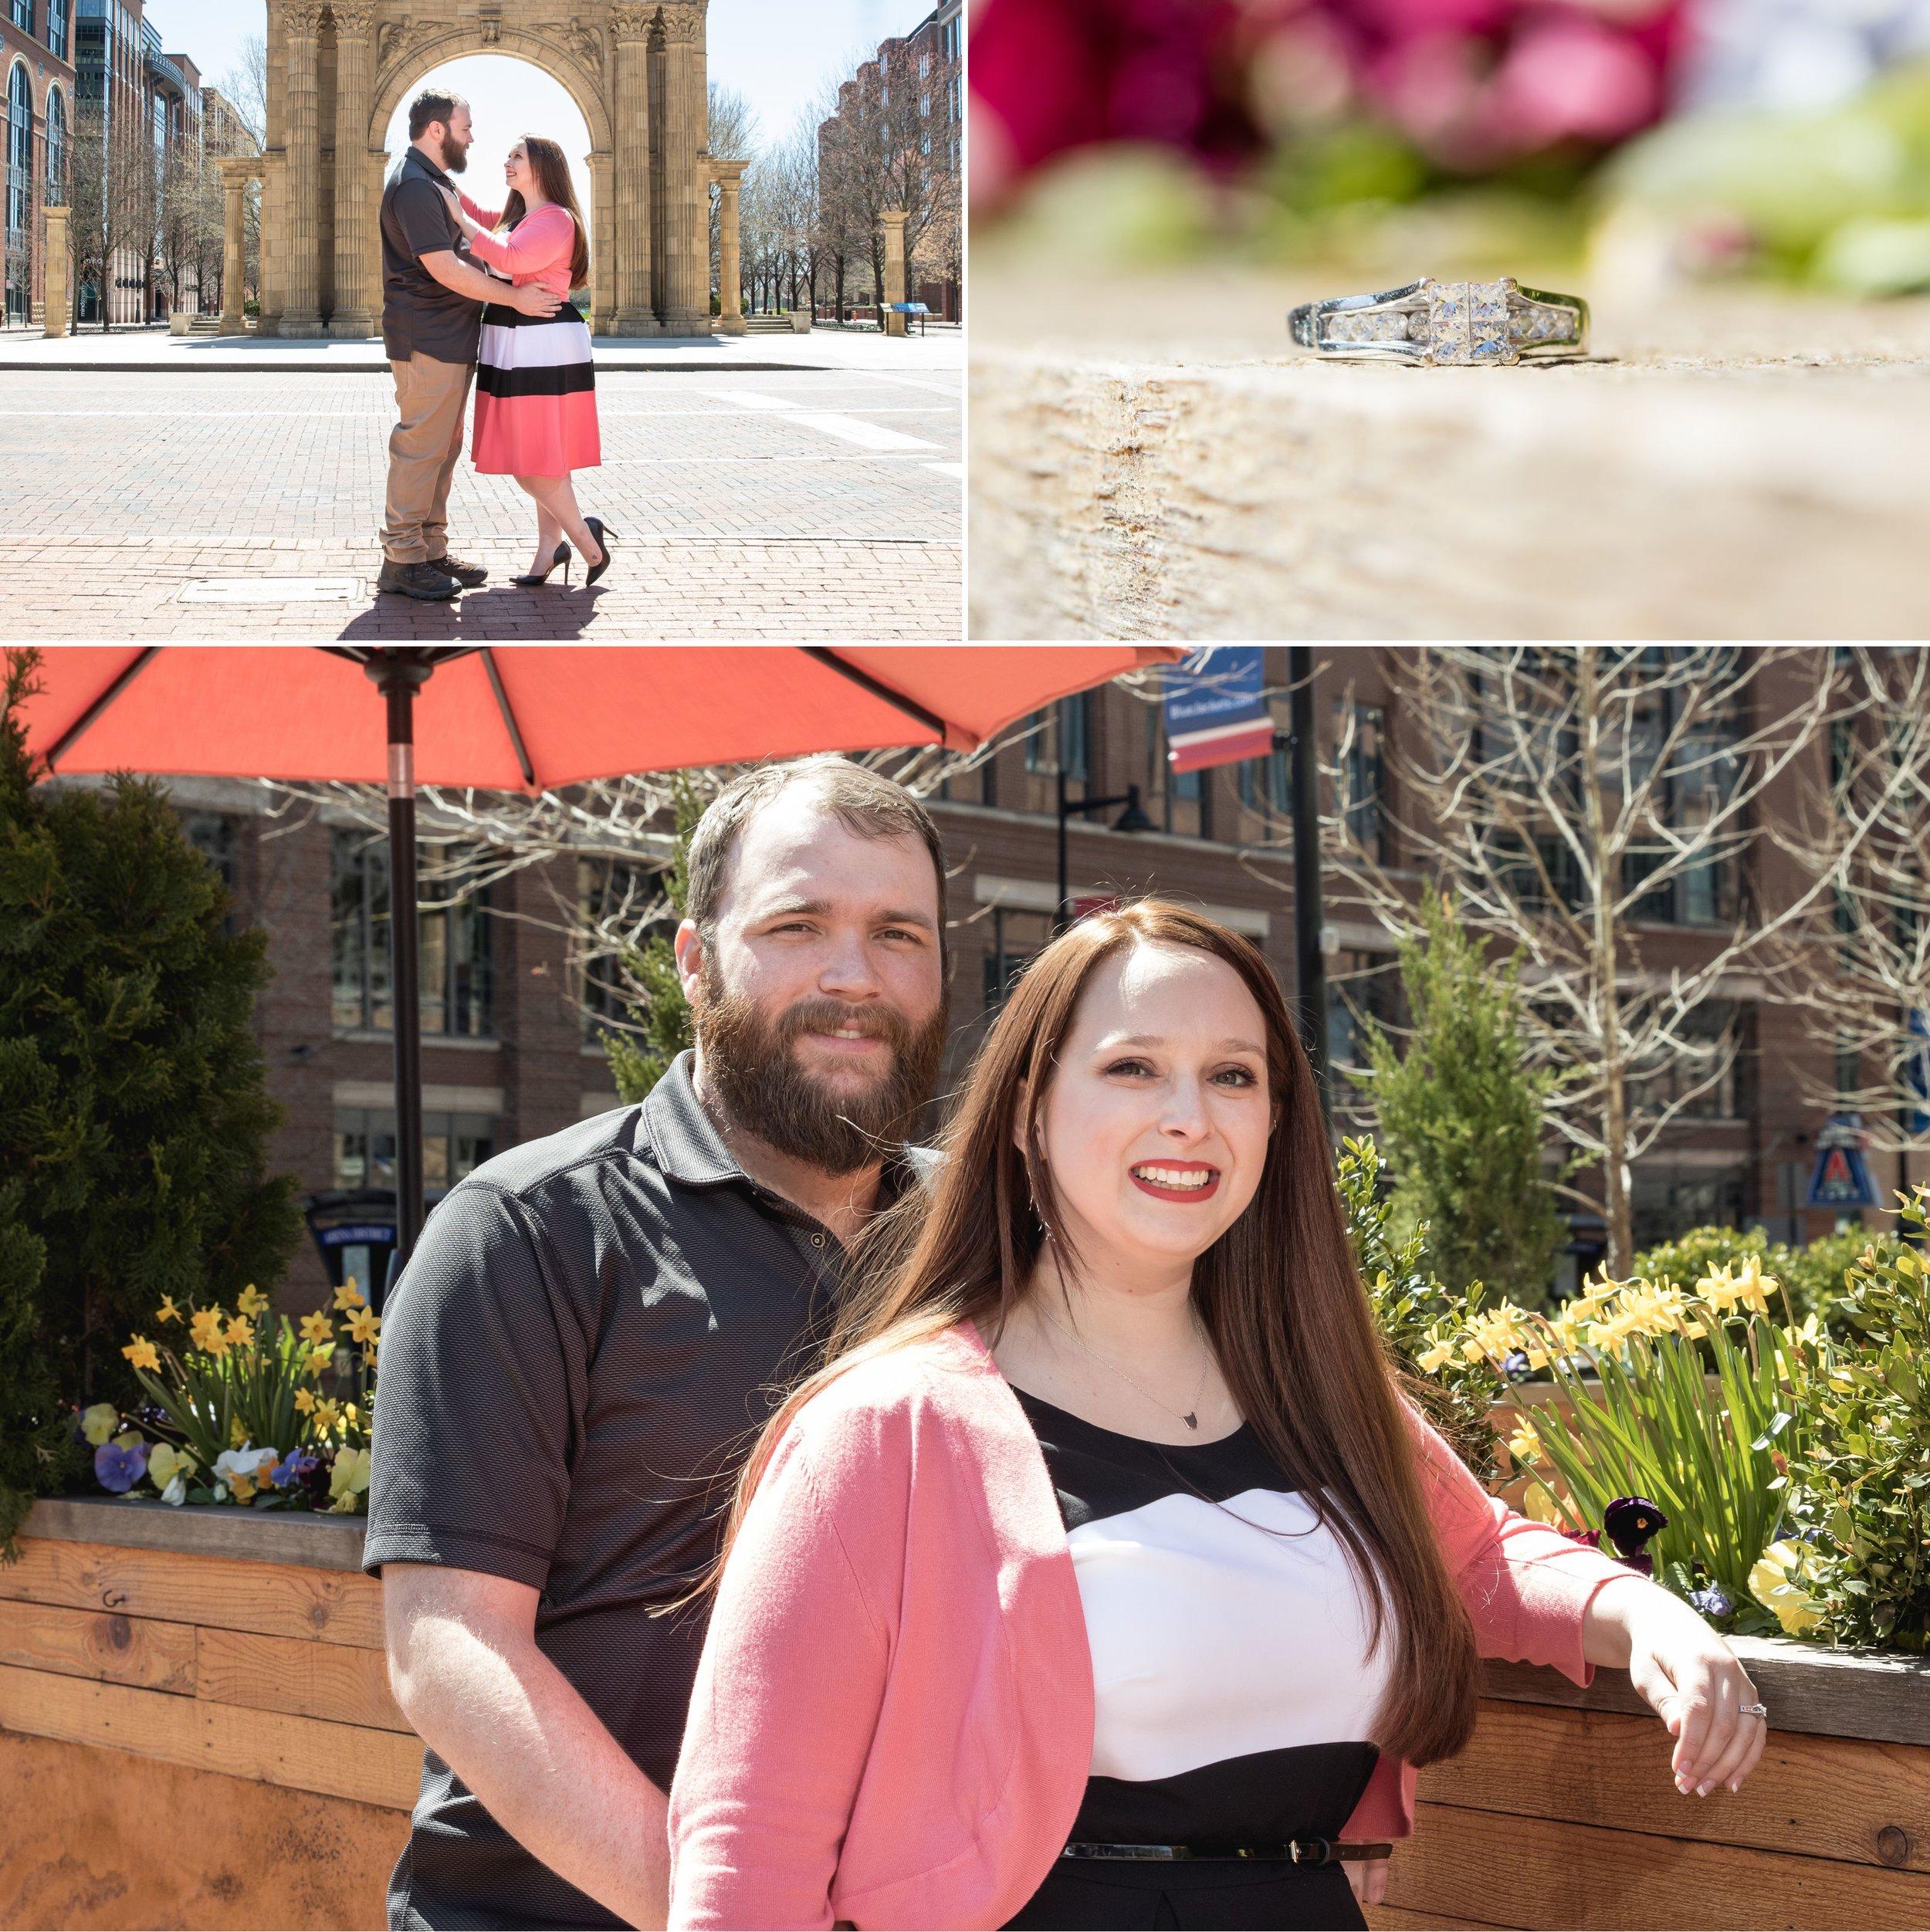 Downtown-Columbus-Ohio-Engagement-Portrait-Session-Bicentennial-Park-McFerson-Commons-Muschlitz-Photography-003.JPG